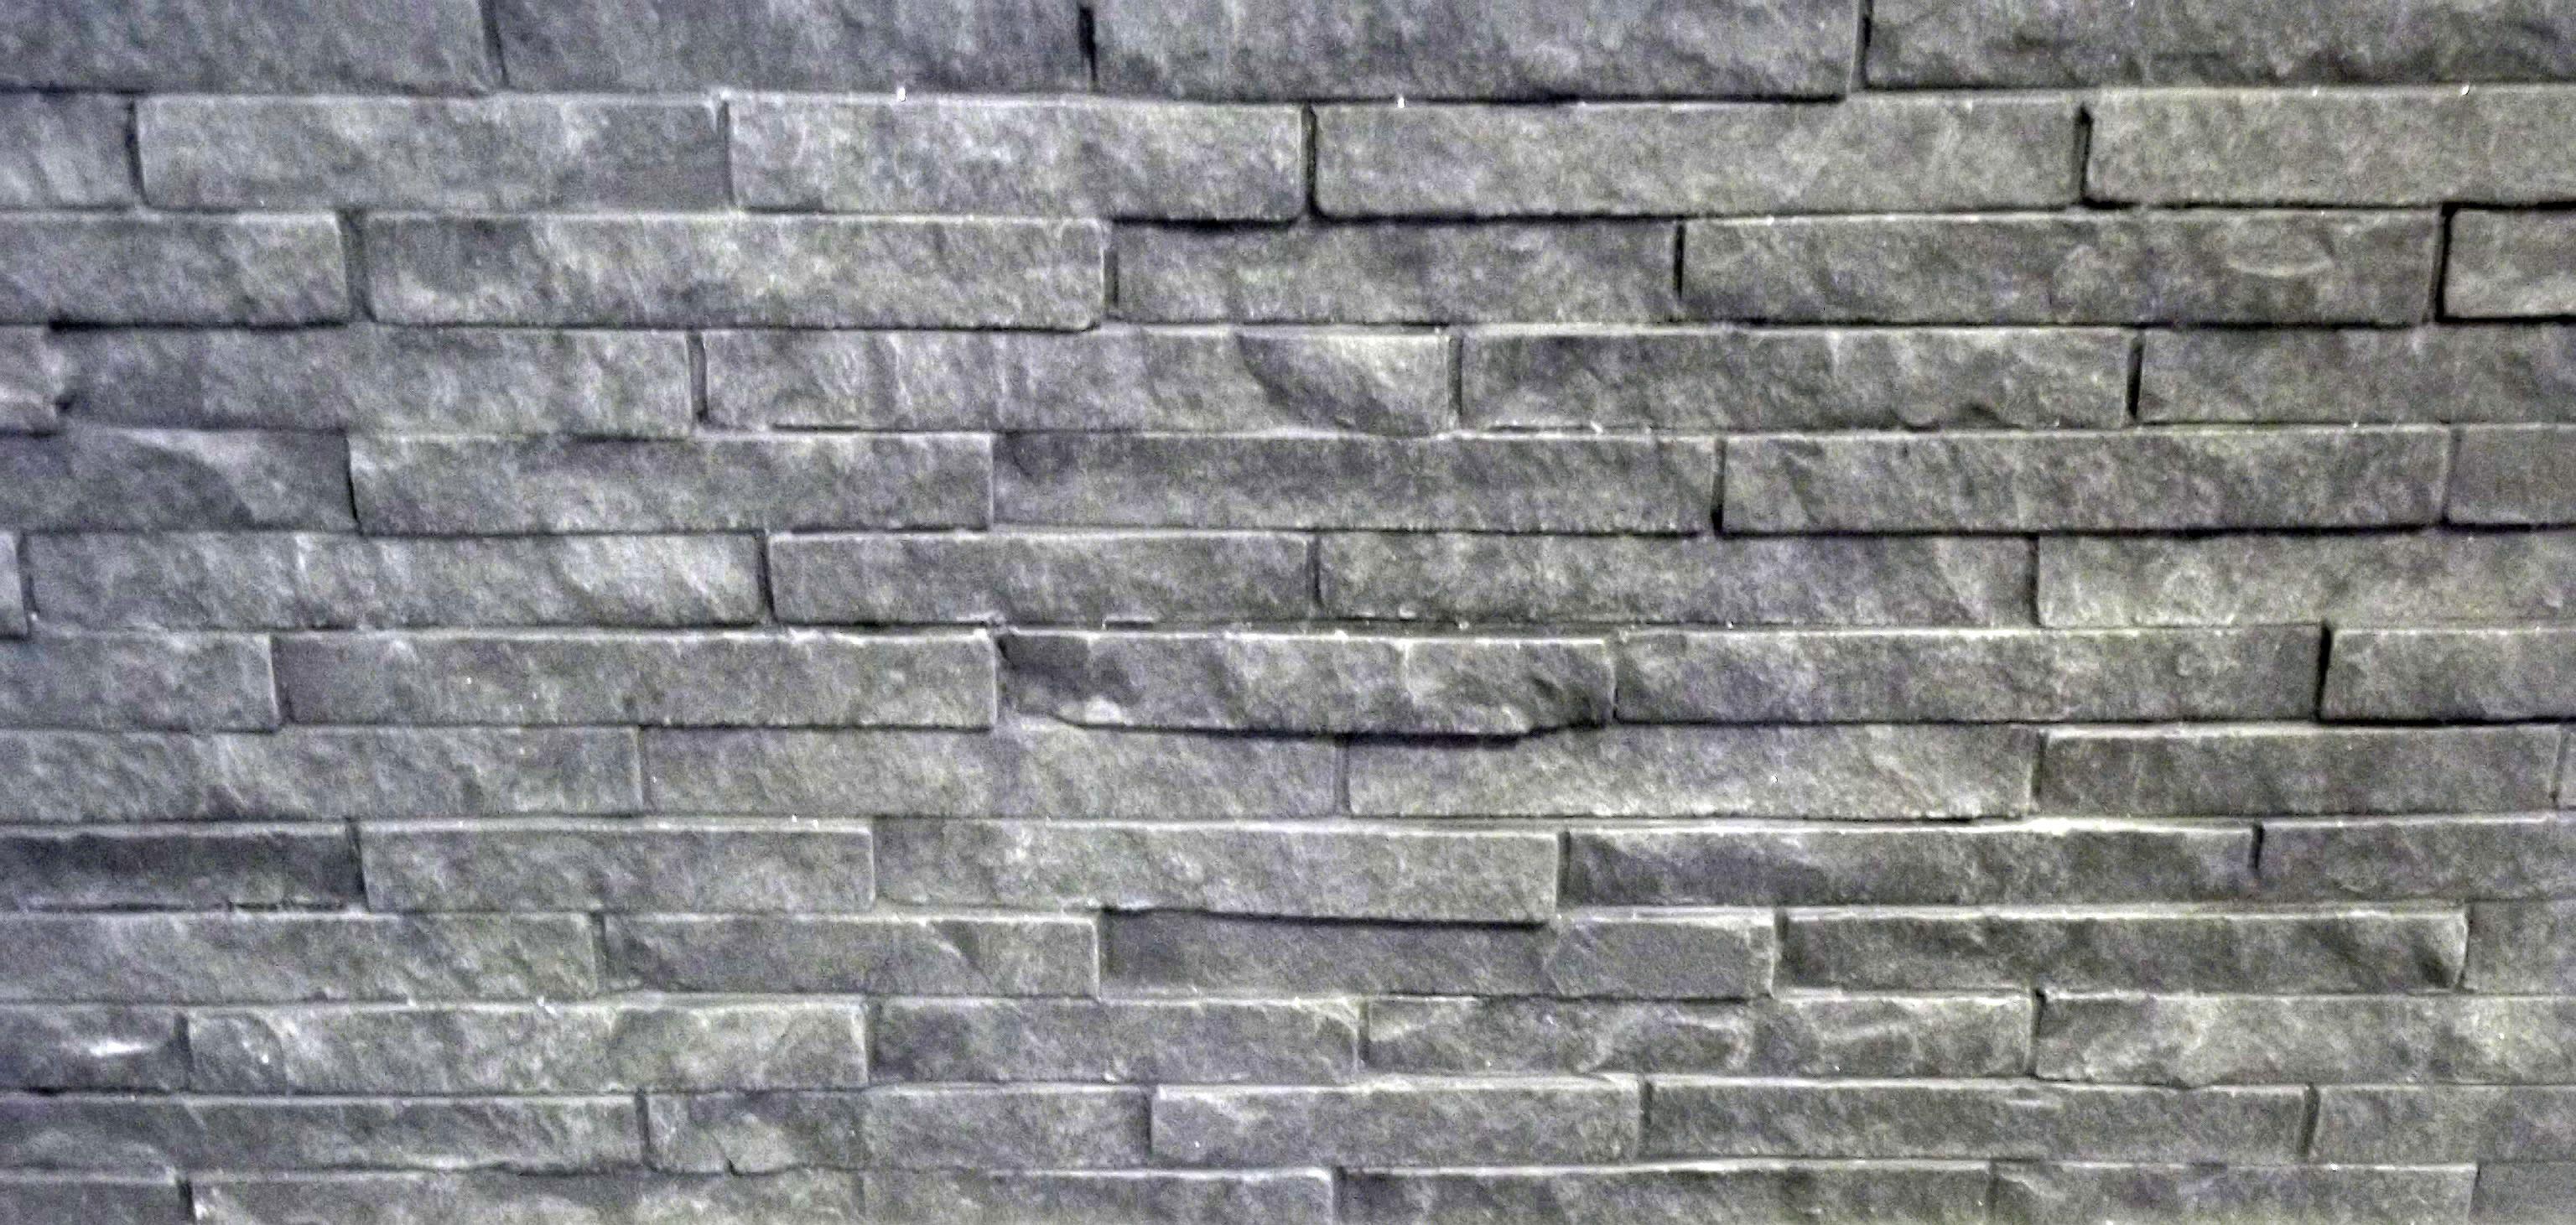 concreto_pedra.jpg (3072×1461)